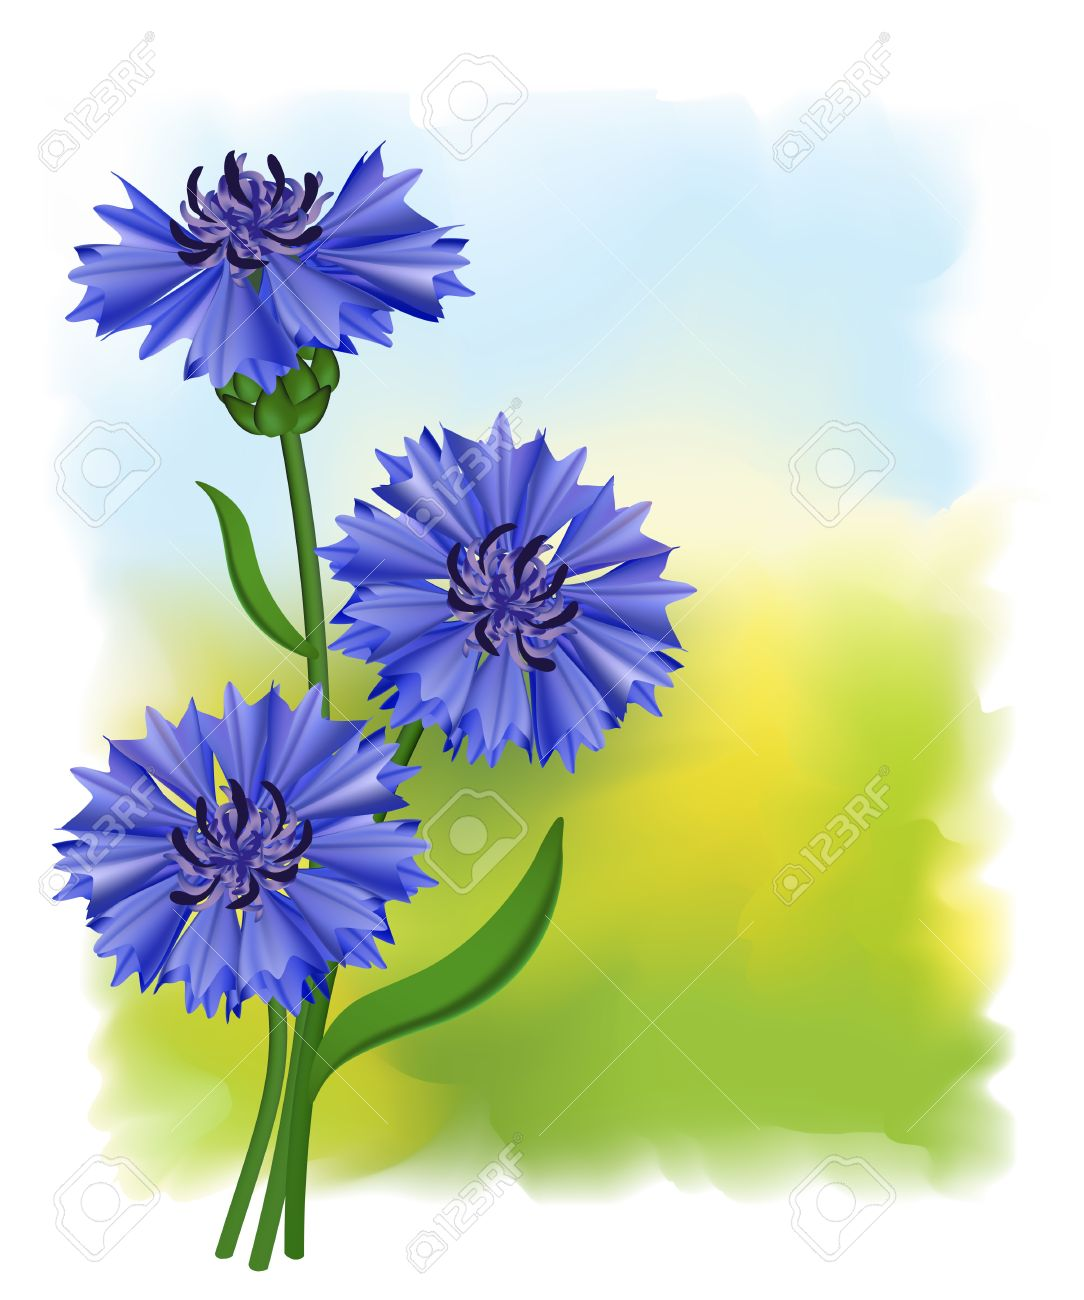 Flowers blue cornflower (Centaurea cyanus). Vector illustration. Stock Vector - 9717955